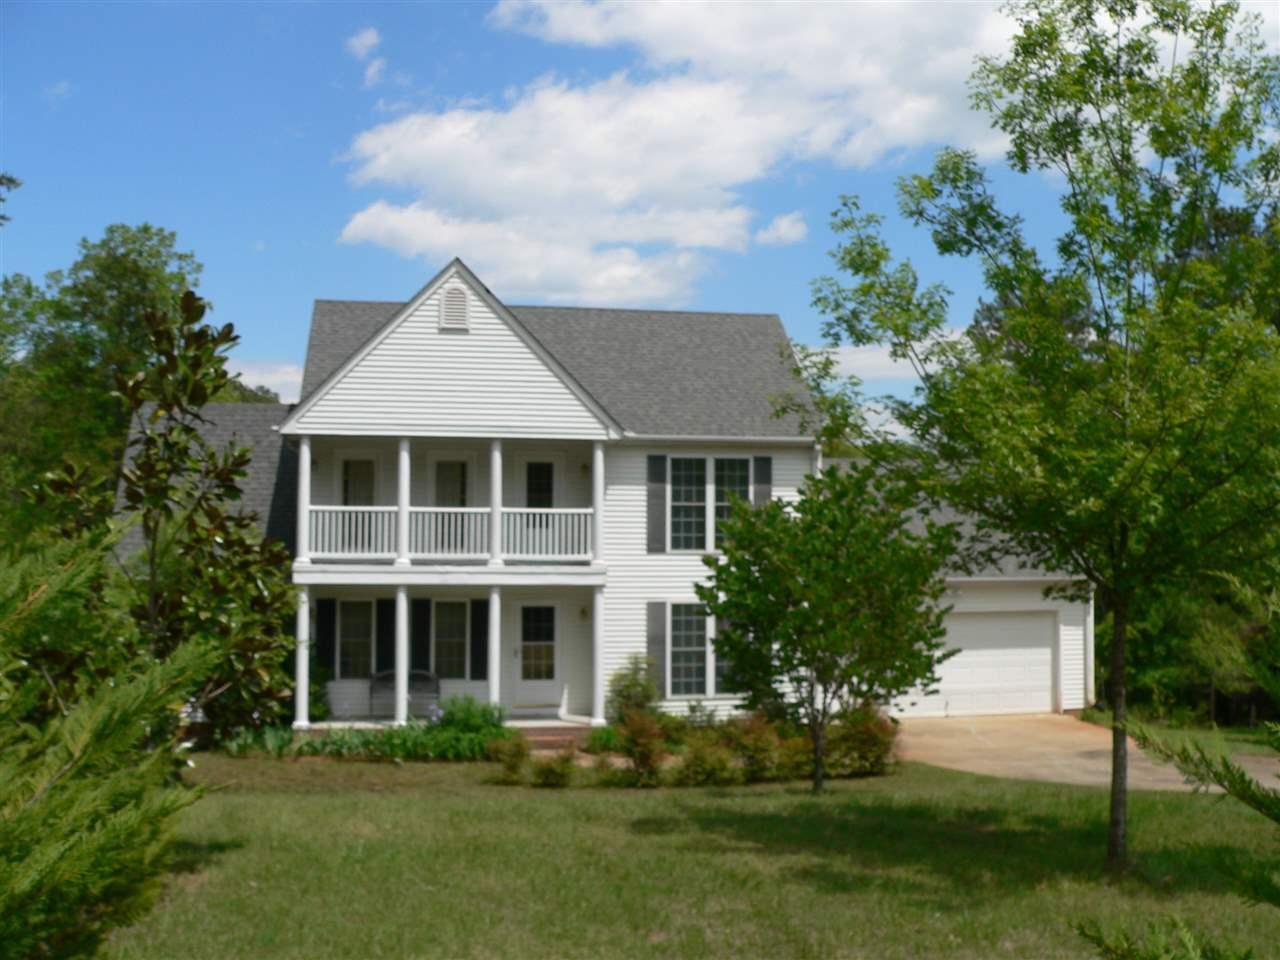 Real Estate for Sale, ListingId: 35636198, Walhalla,SC29691